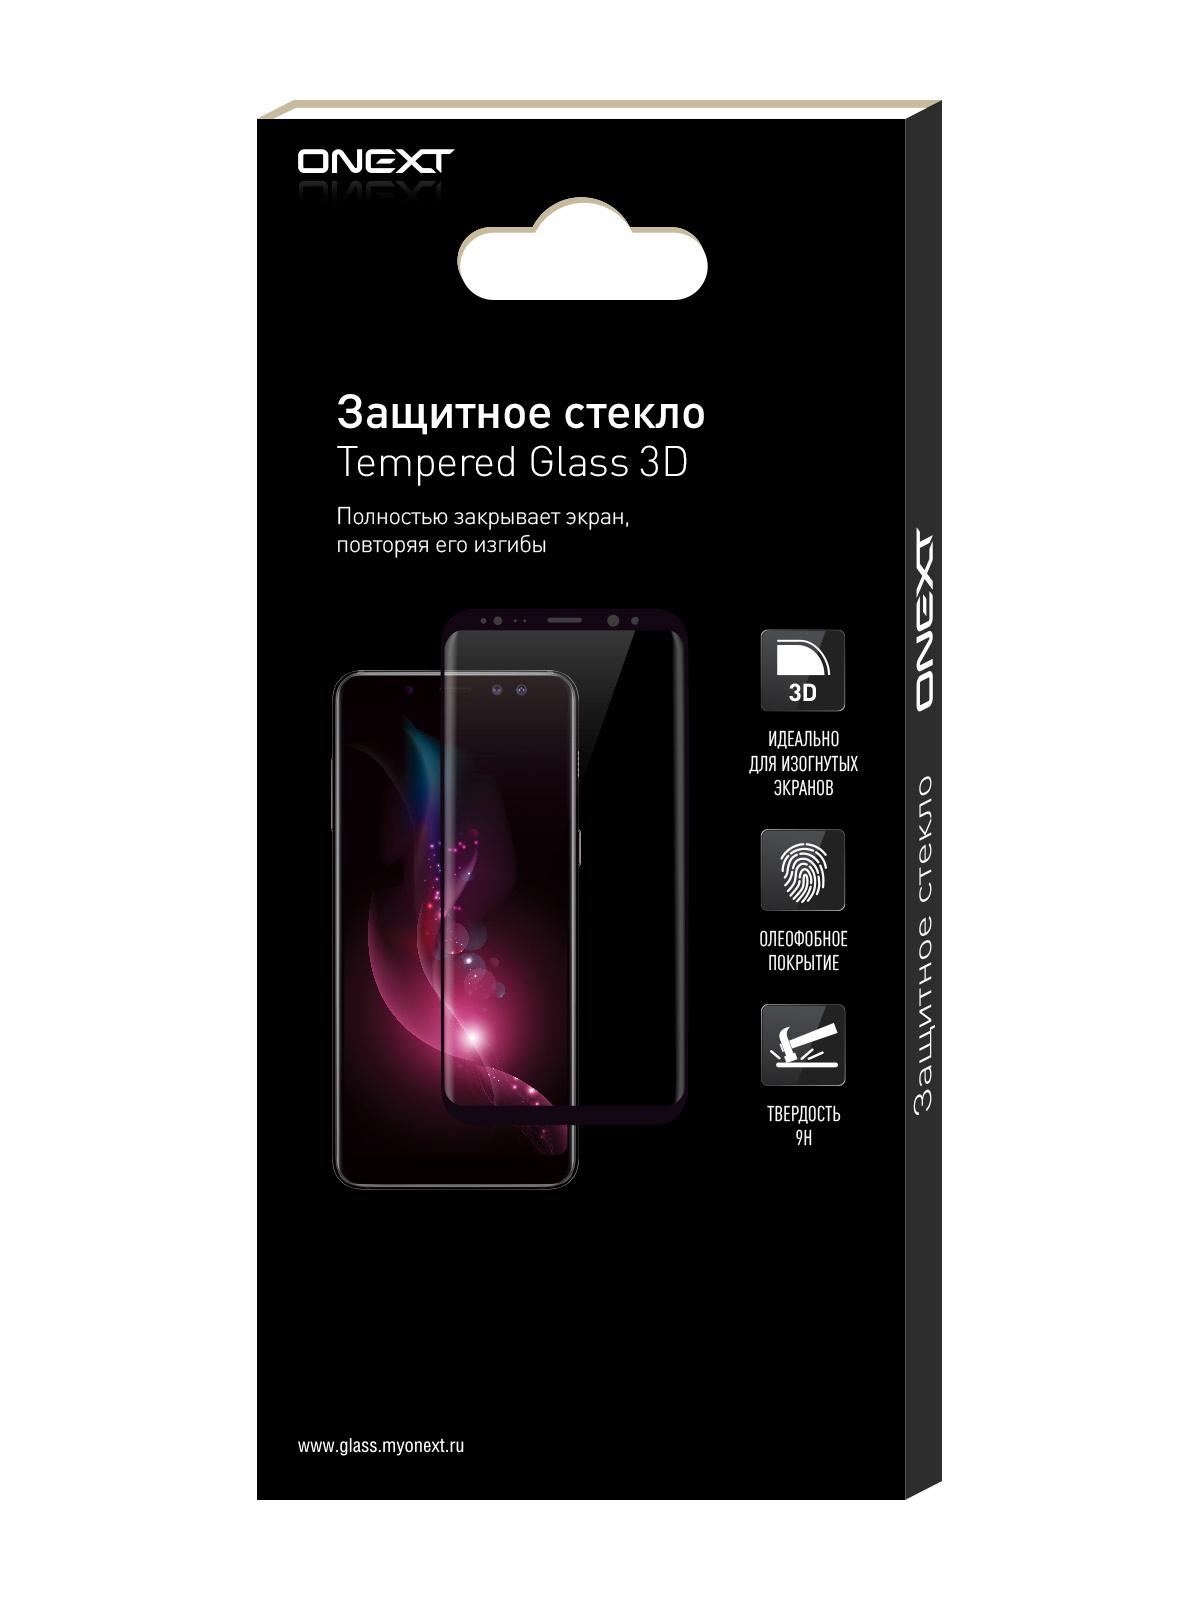 Защитное стекло ONEXT Nokia 6 Plus, 3D цена и фото